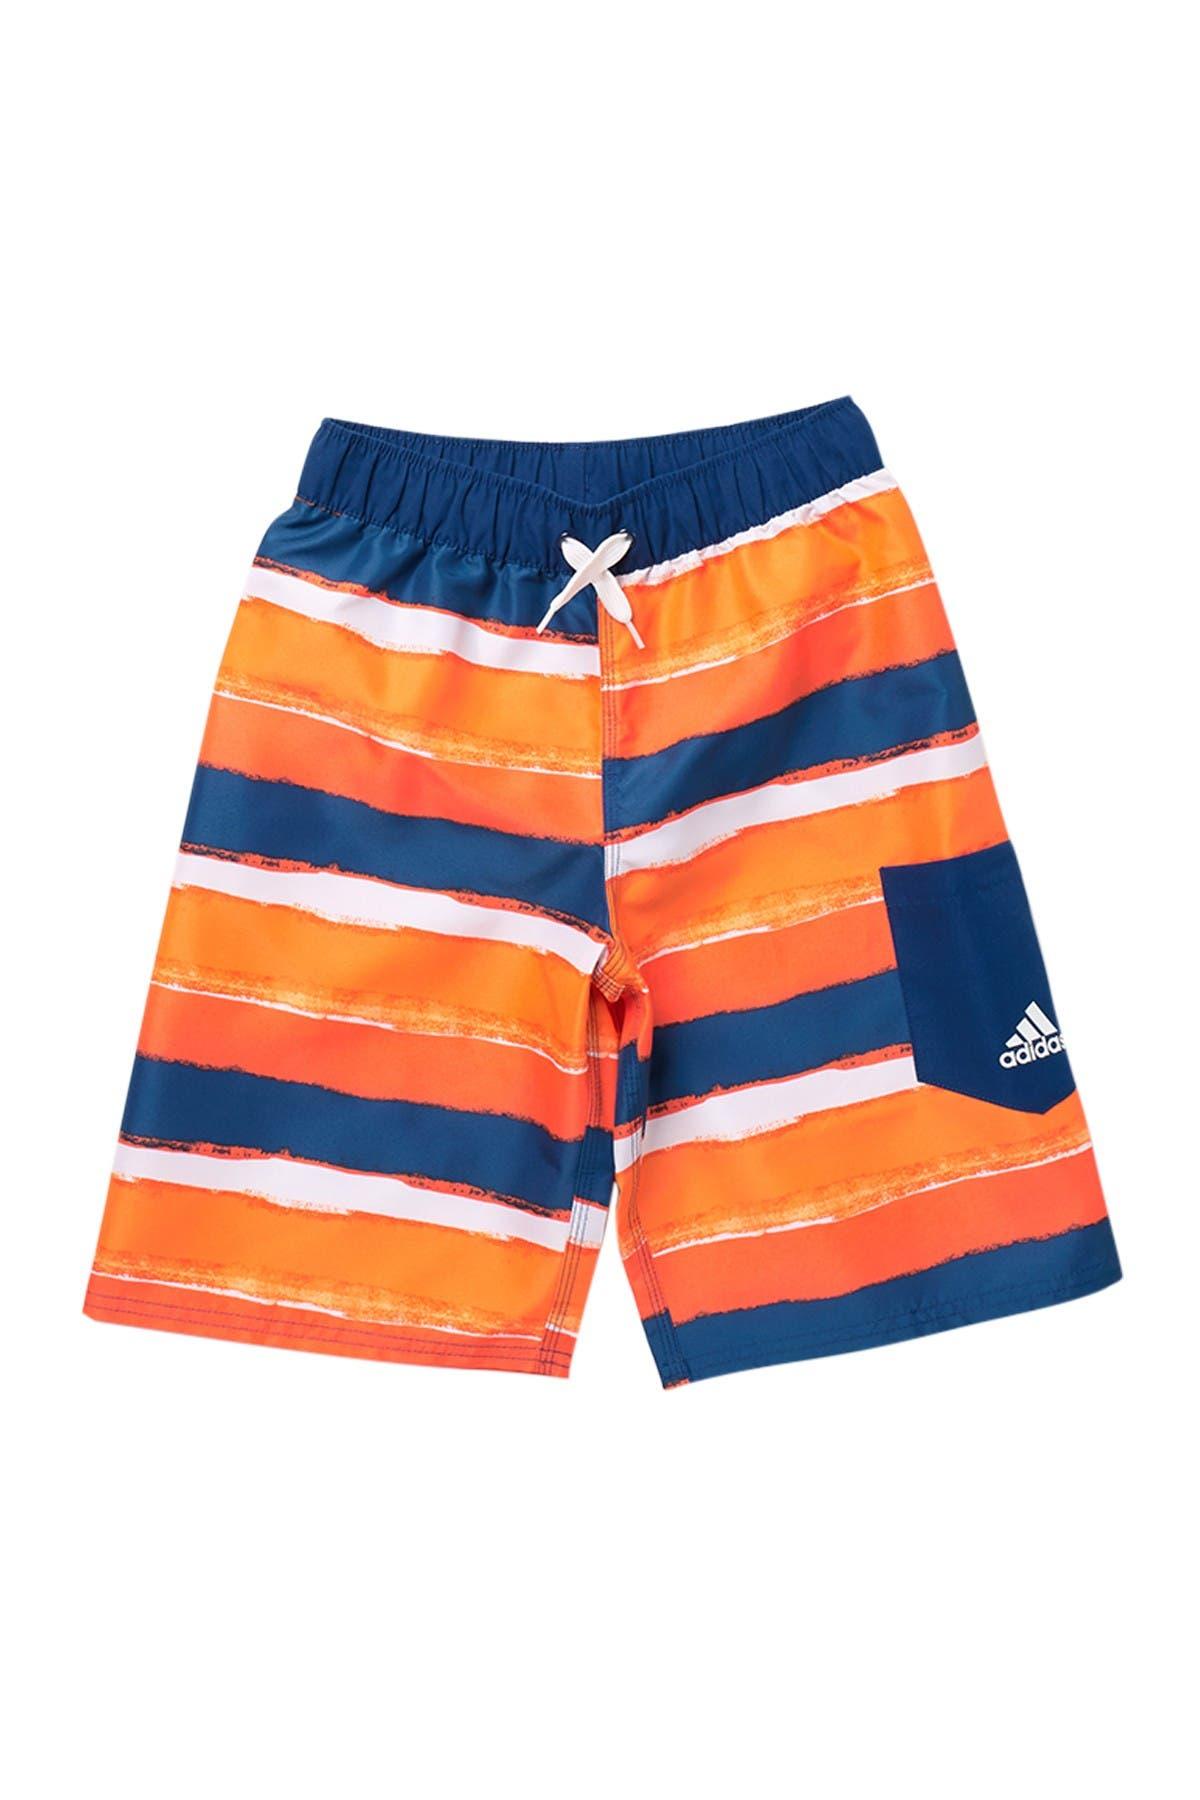 Image of ADIDAS SWIMWEAR Waterstripe Shorts